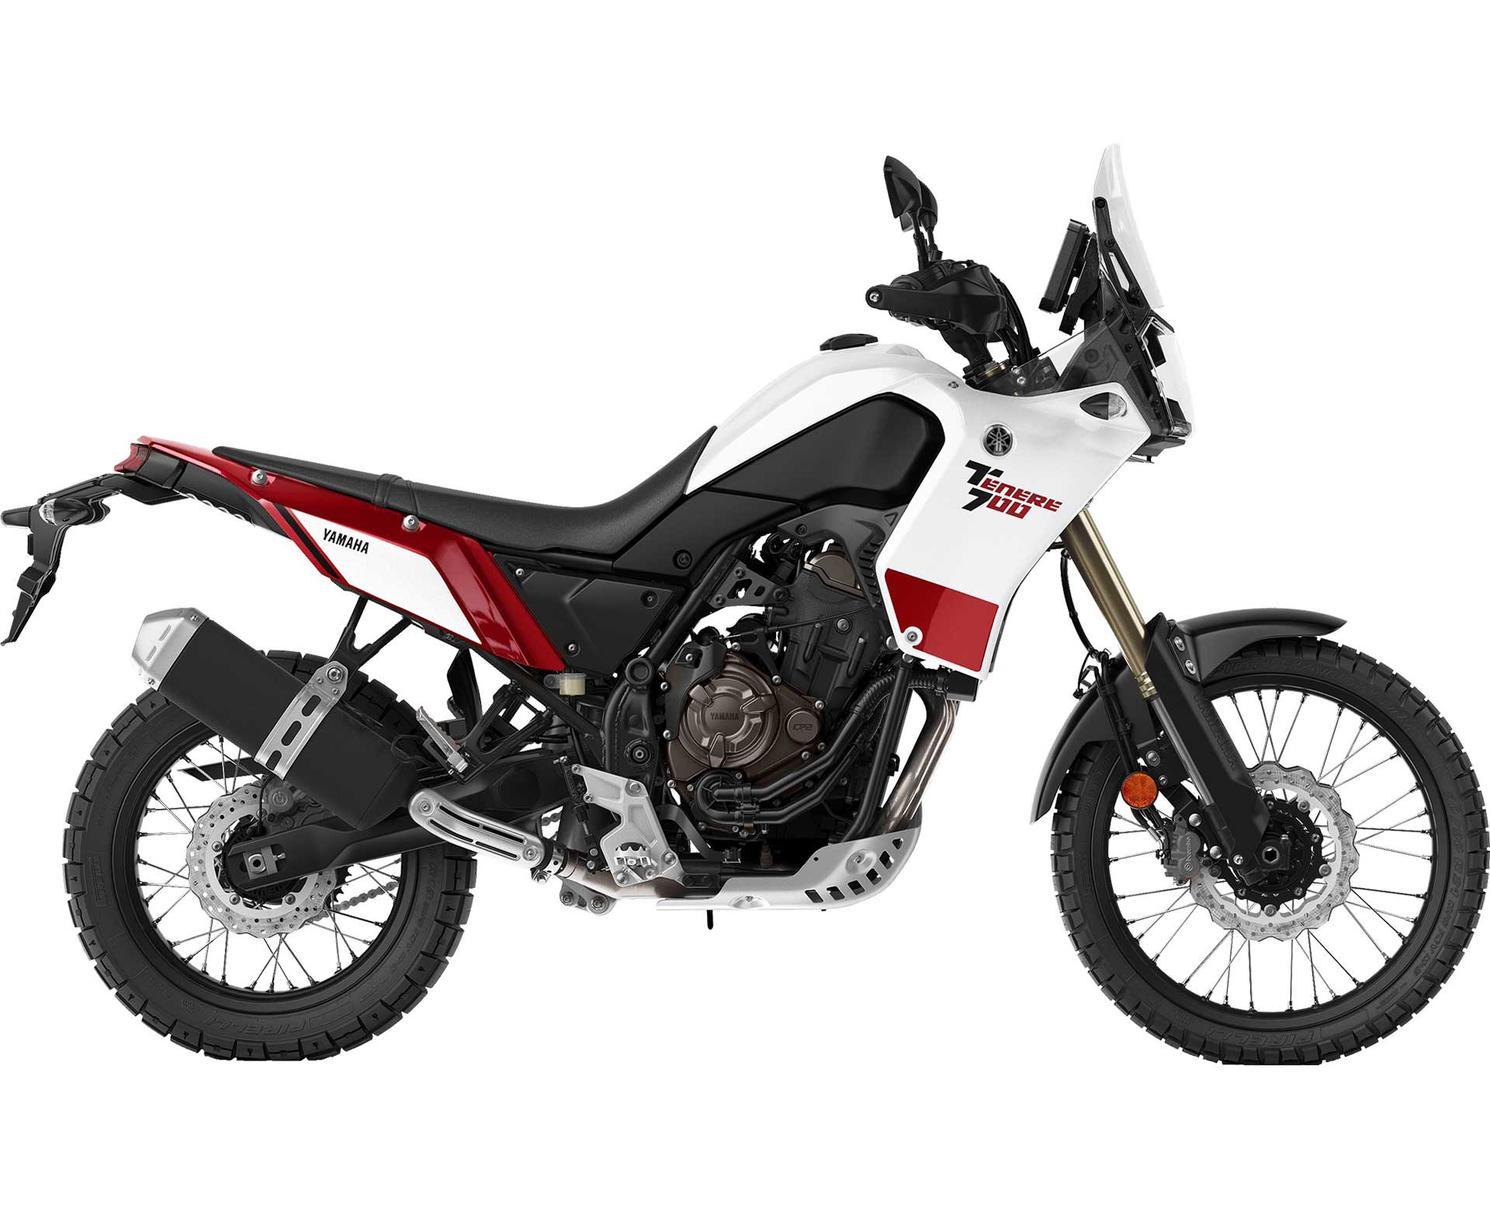 2021 Yamaha Ténéré 700 White-Tan